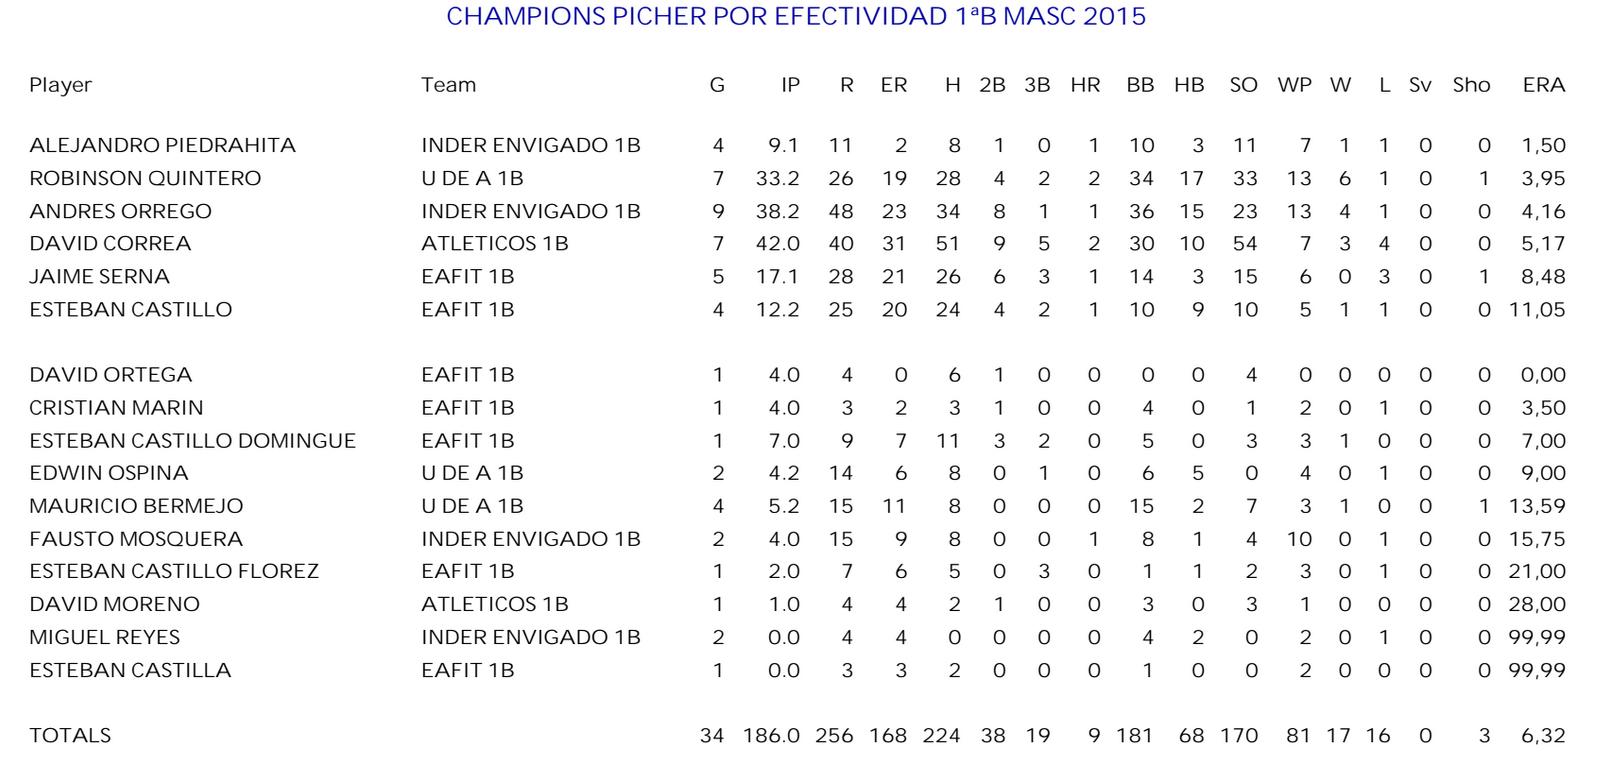 mejores-pitchers-primera-b-masculina-campeones-2015